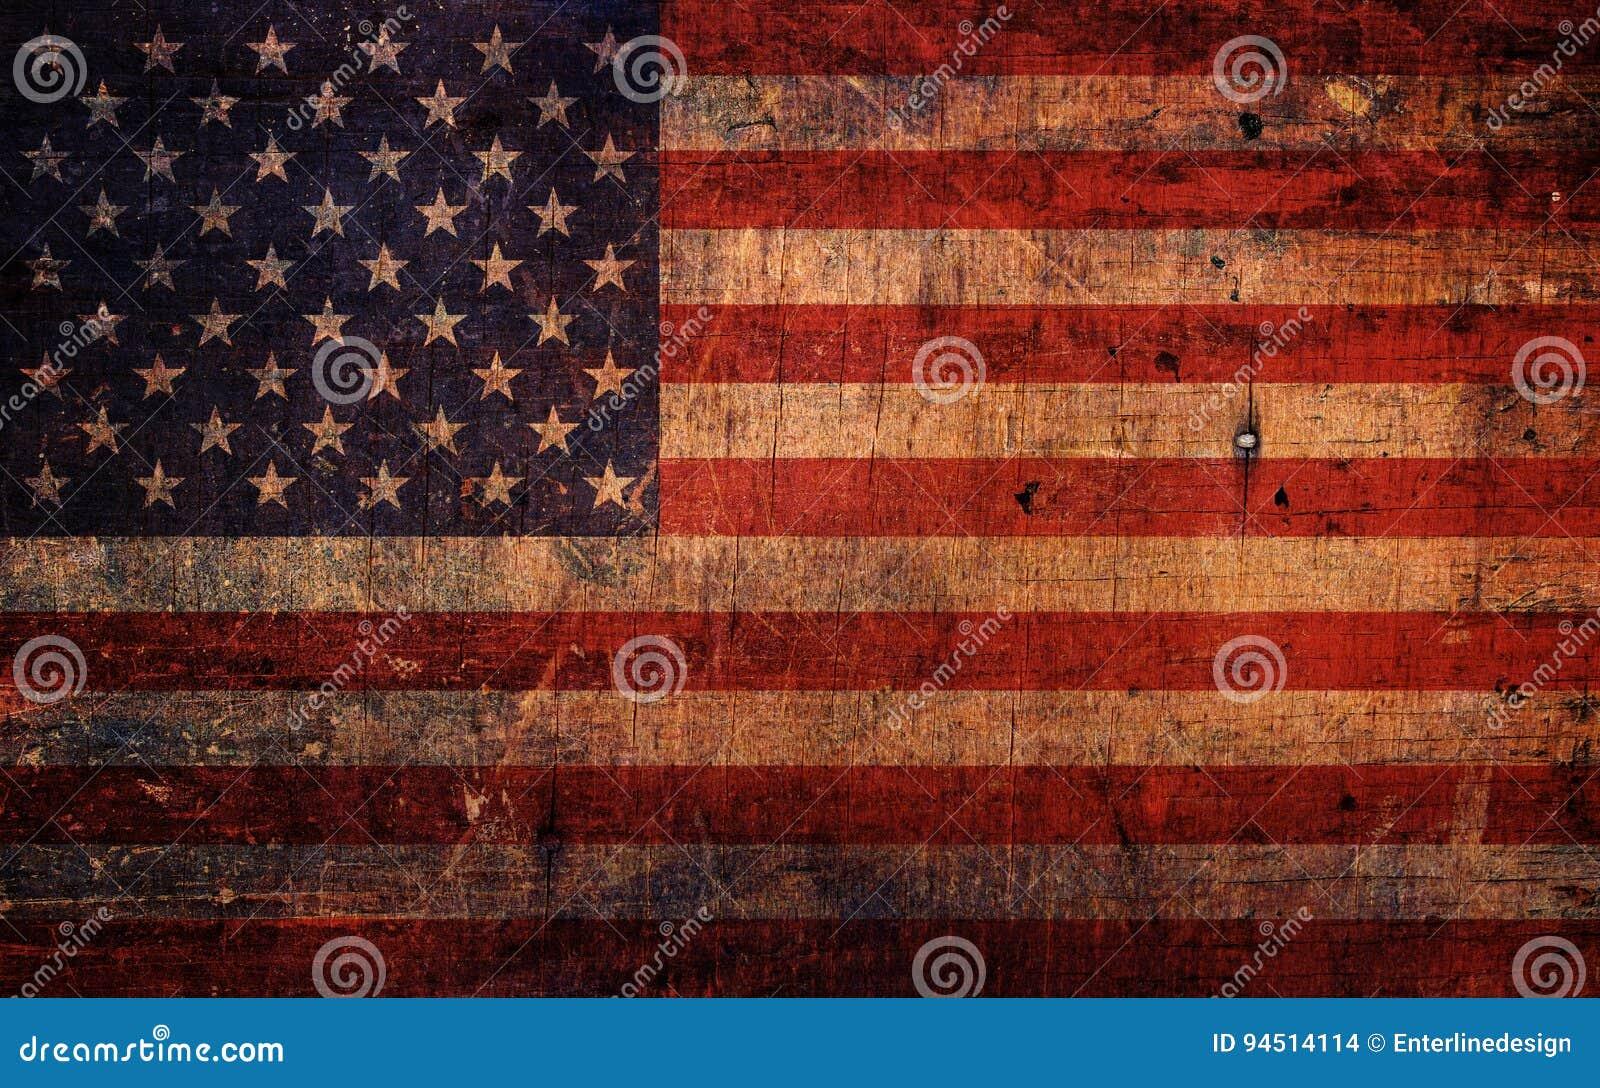 Download Vintage Old Grunge American Flag Stock Photo - Image of vintage, dirty: 94514114